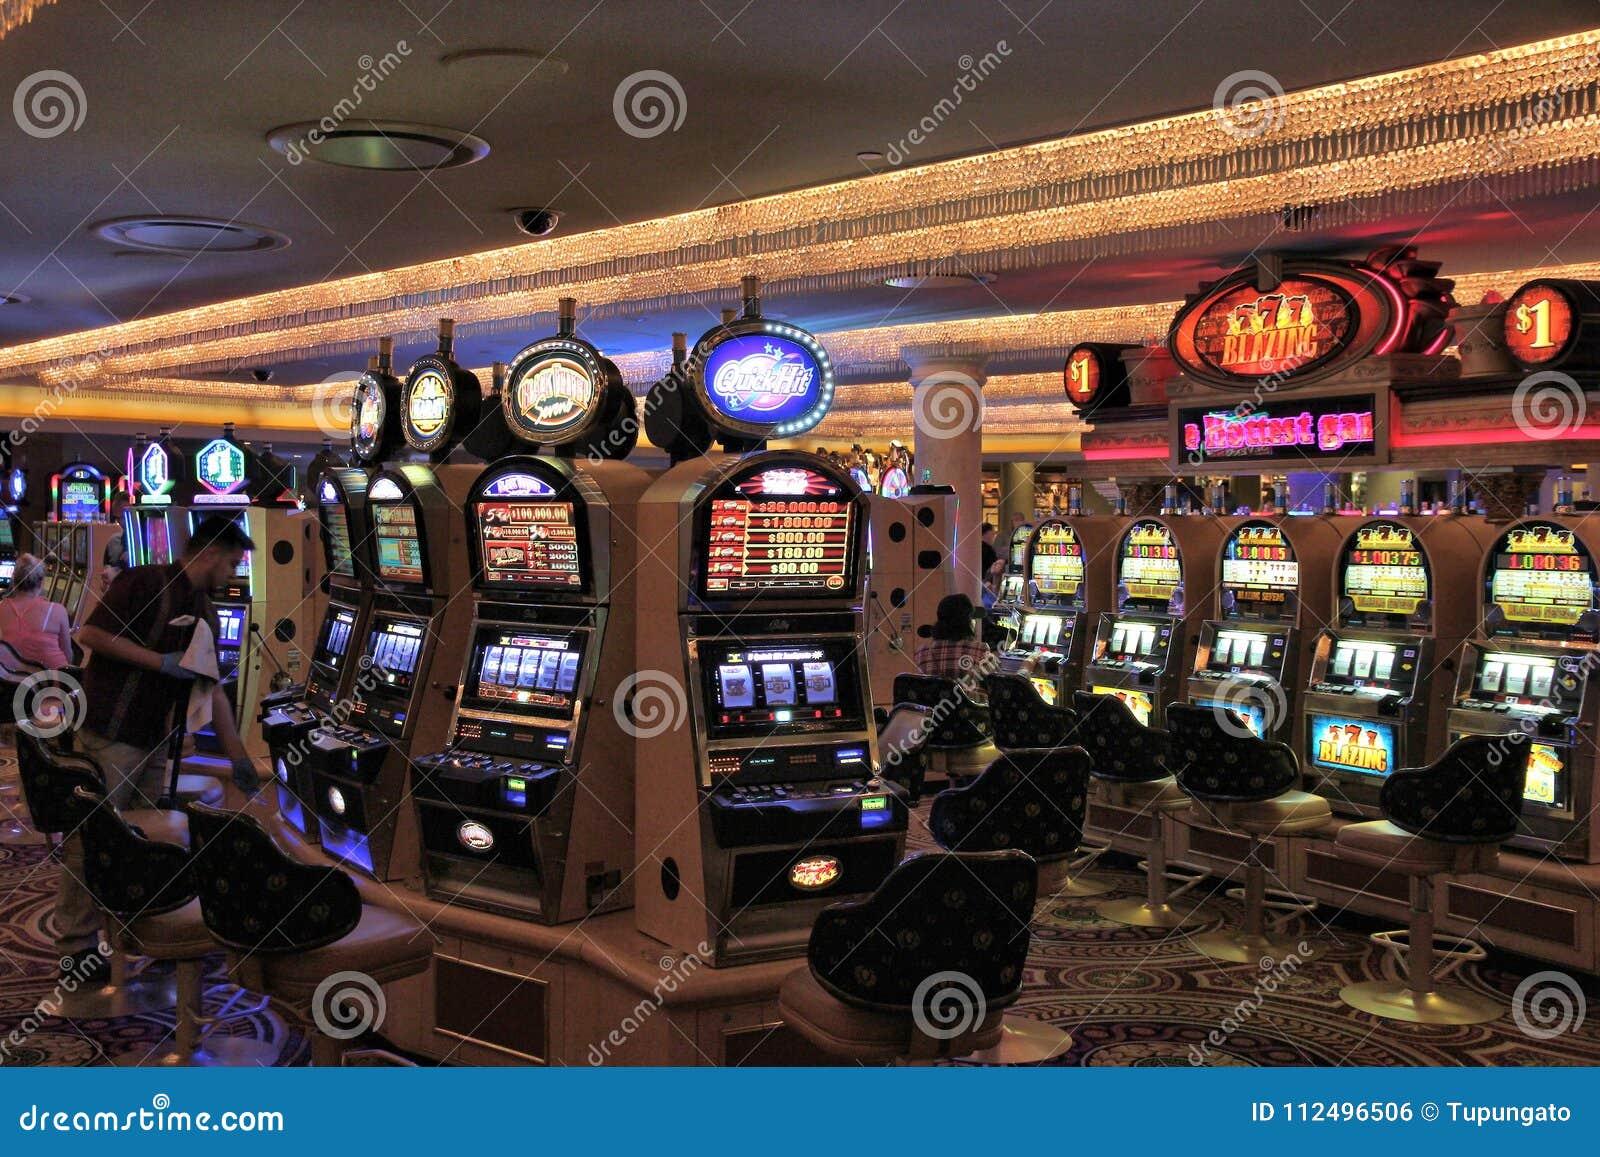 Caesars Casino Slot >> Las Vegas Slots Editorial Photo Image Of North Strip 112496506